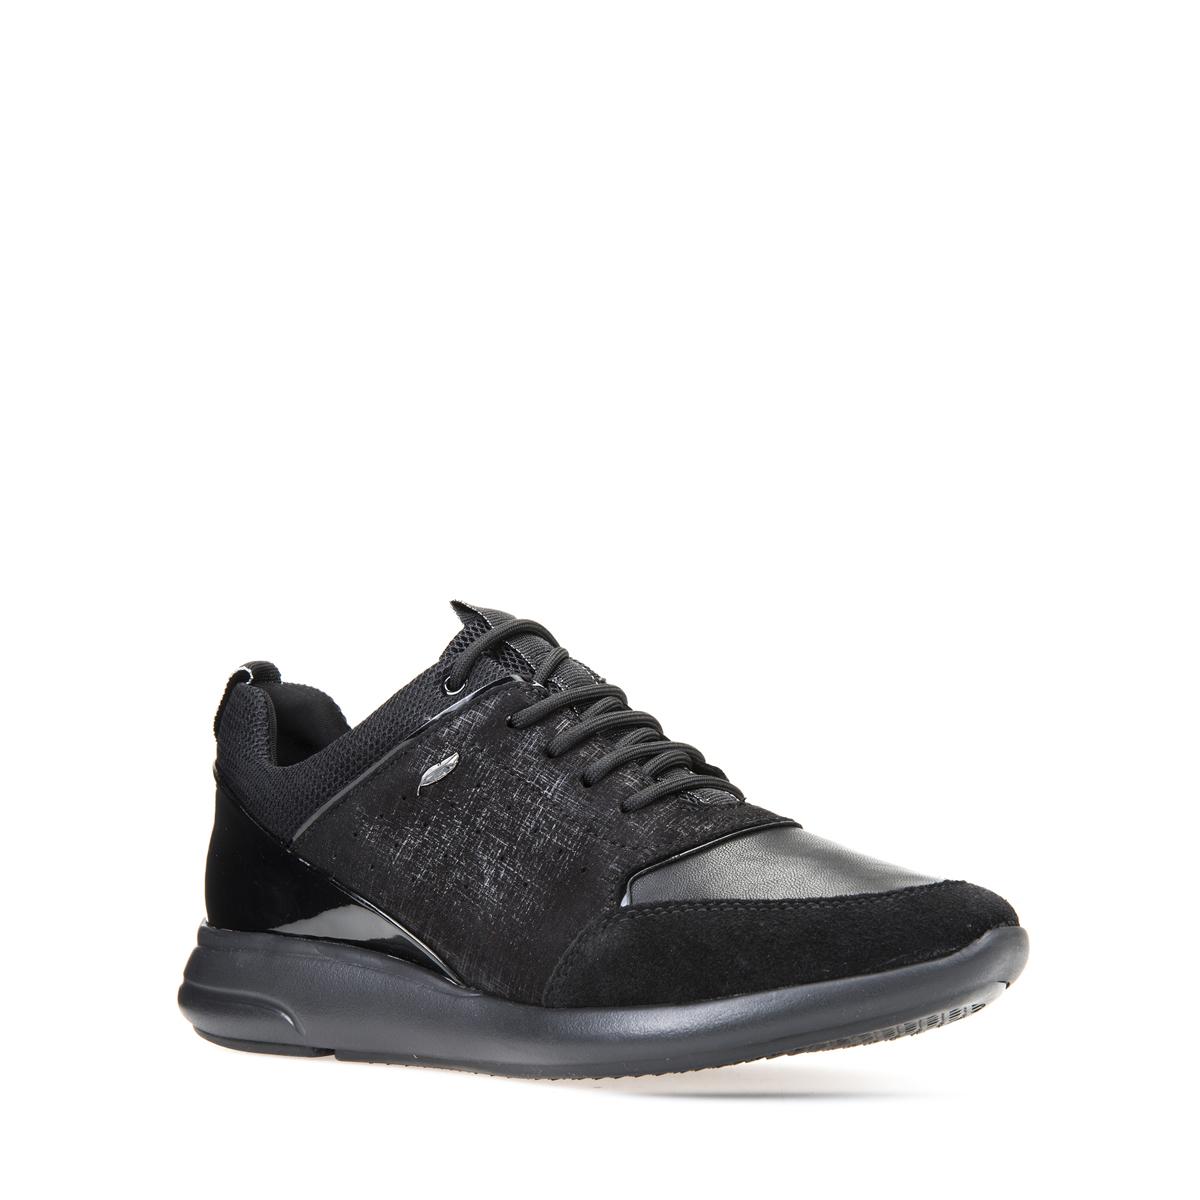 Acquista scarpe human race donna rosse  016e61db352